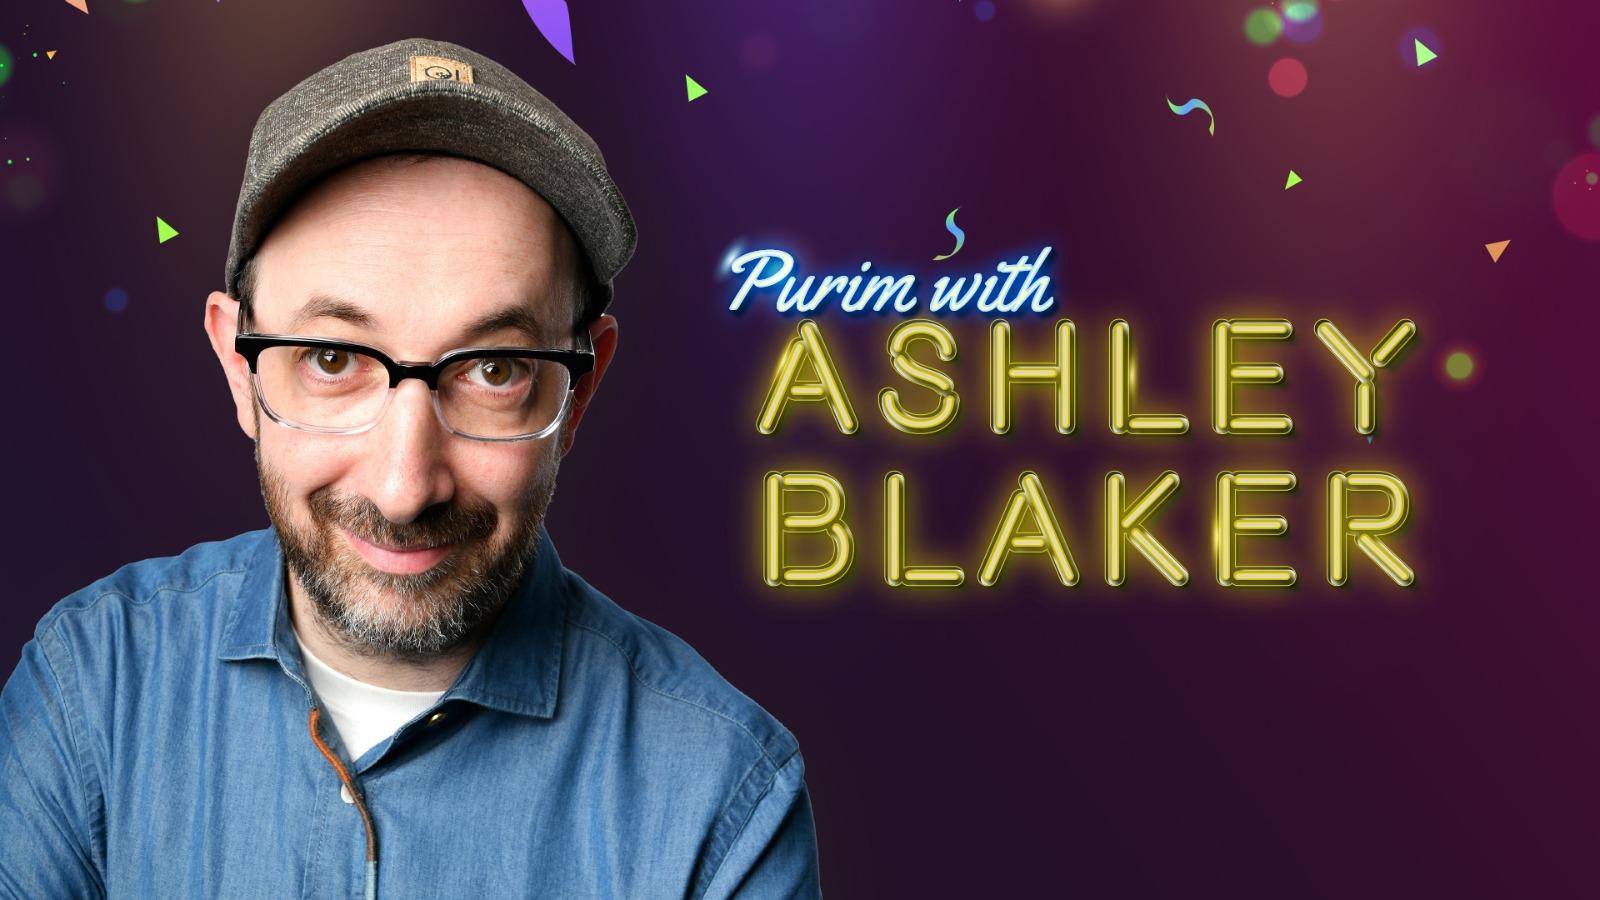 Purim with Ashley Blaker